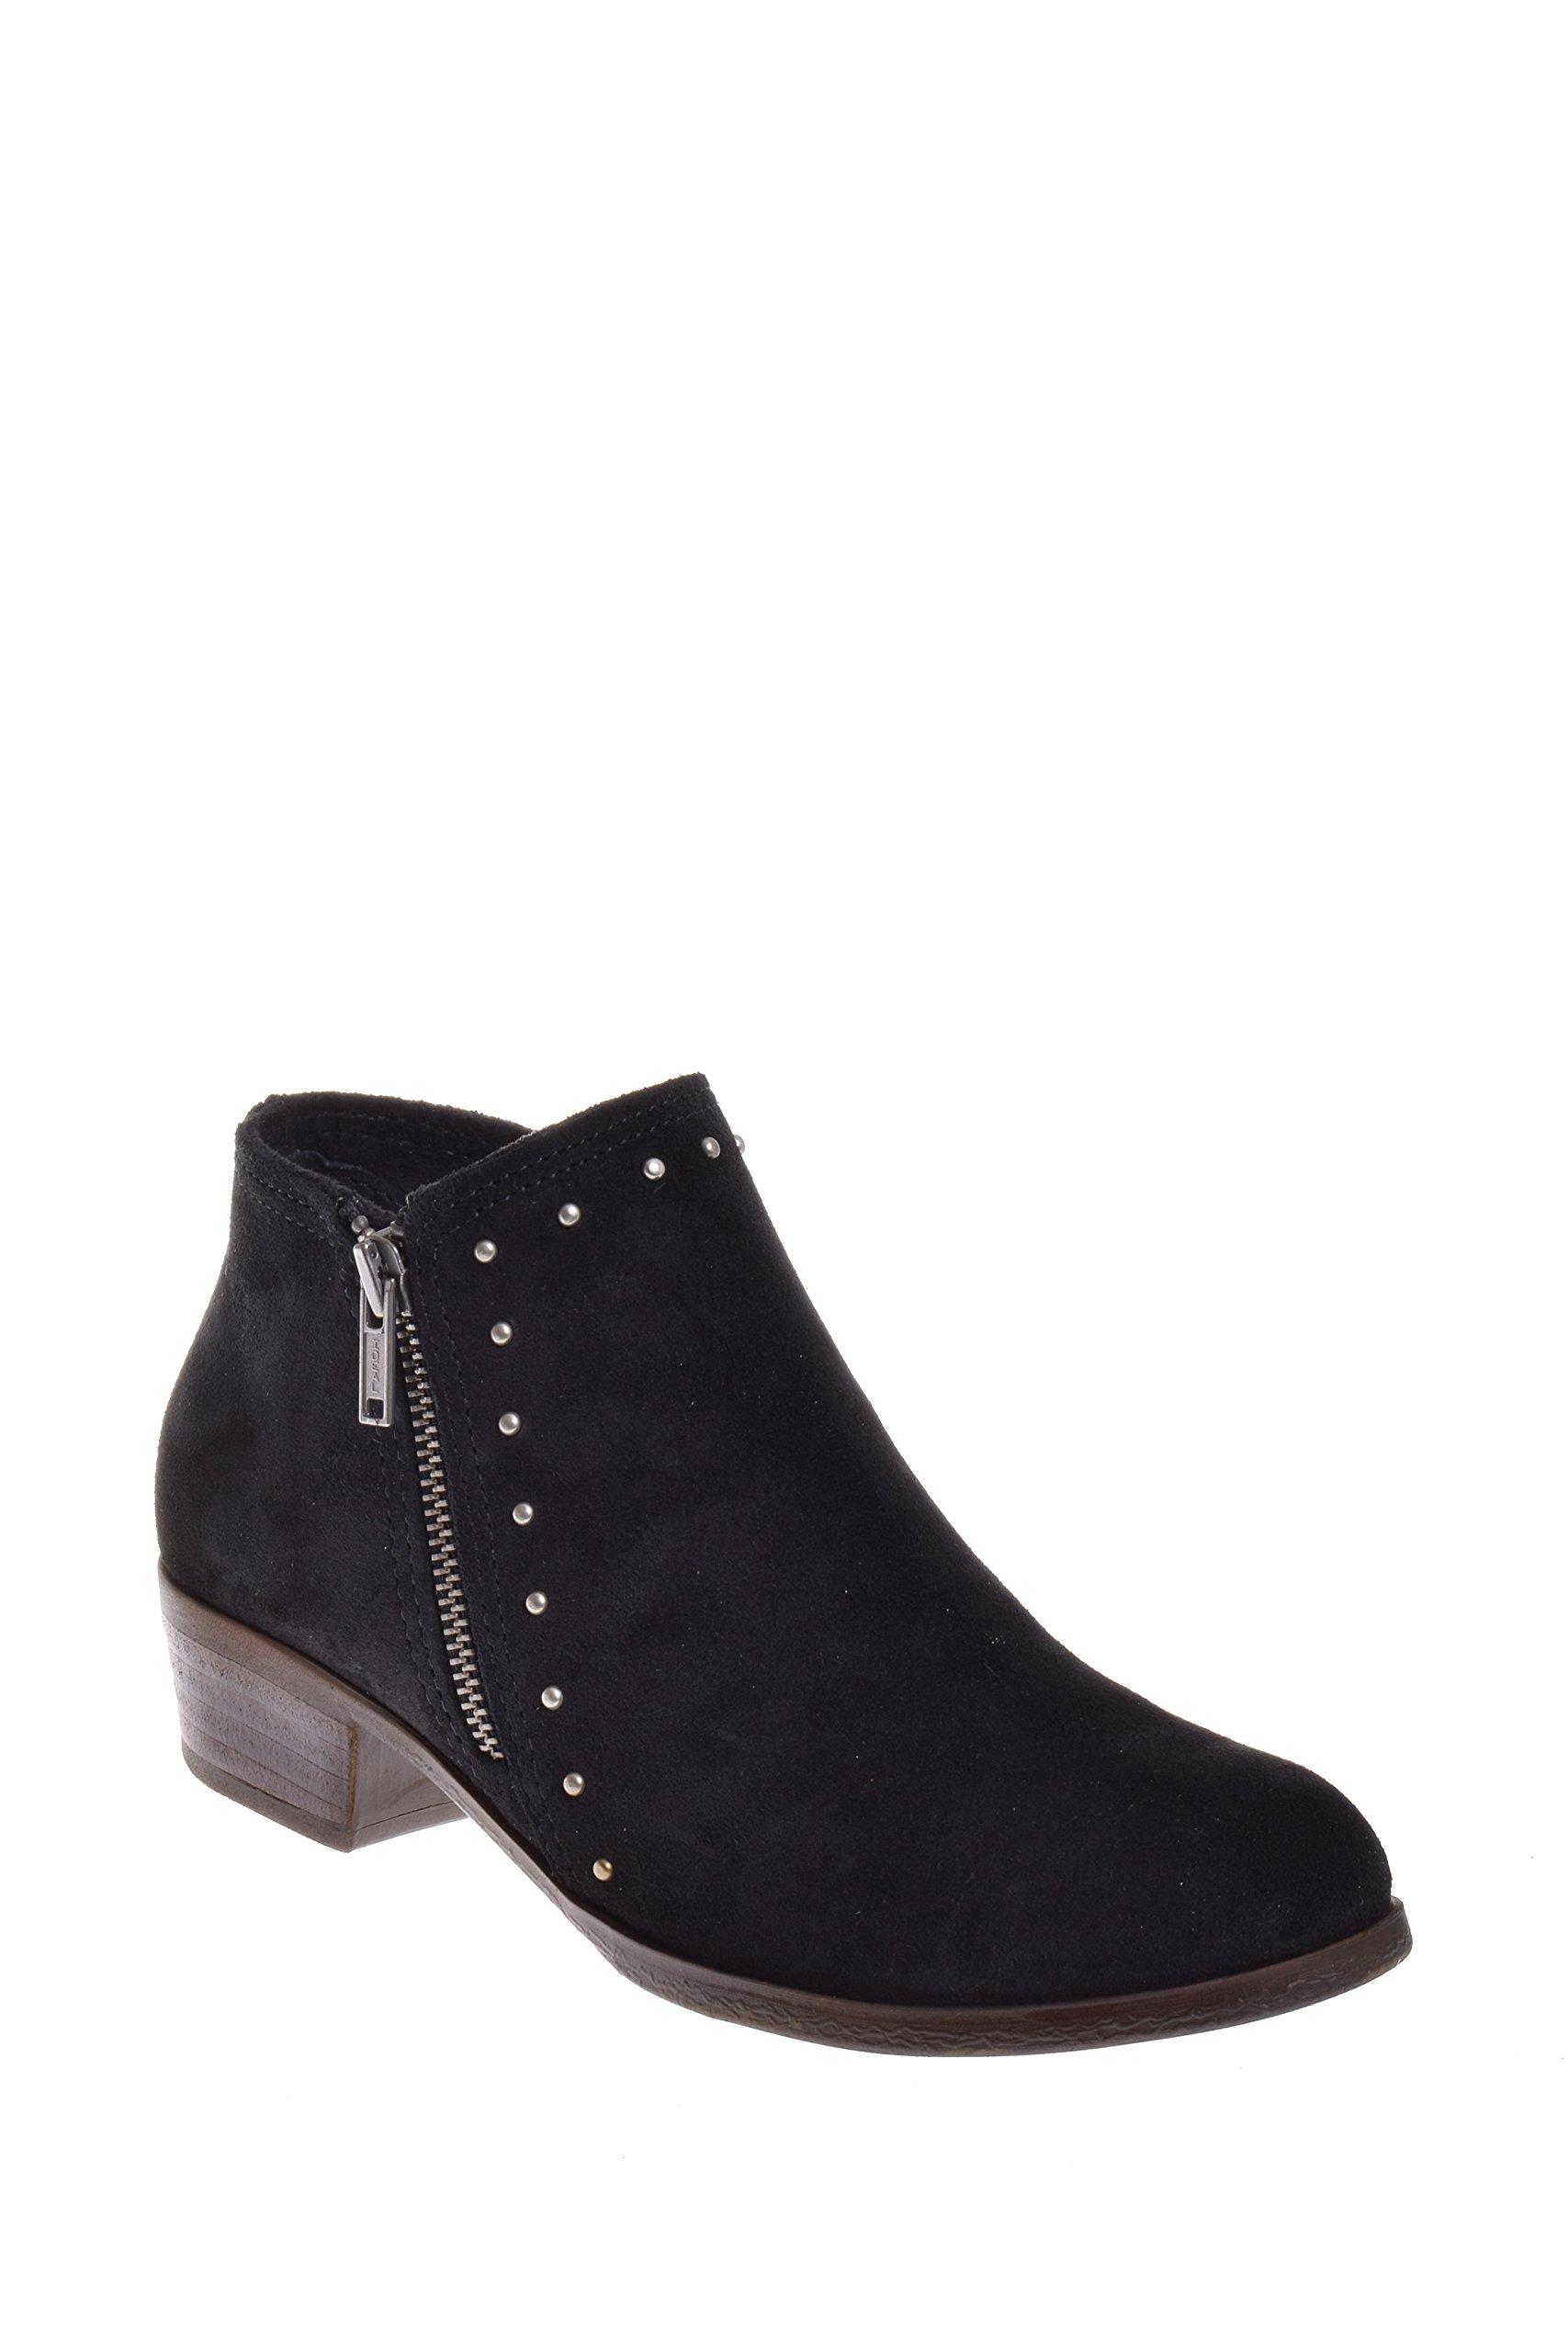 Minnetonka Women's Brie Side Zip Stud Boot Round Toe (9.5 B(M) US, Black)